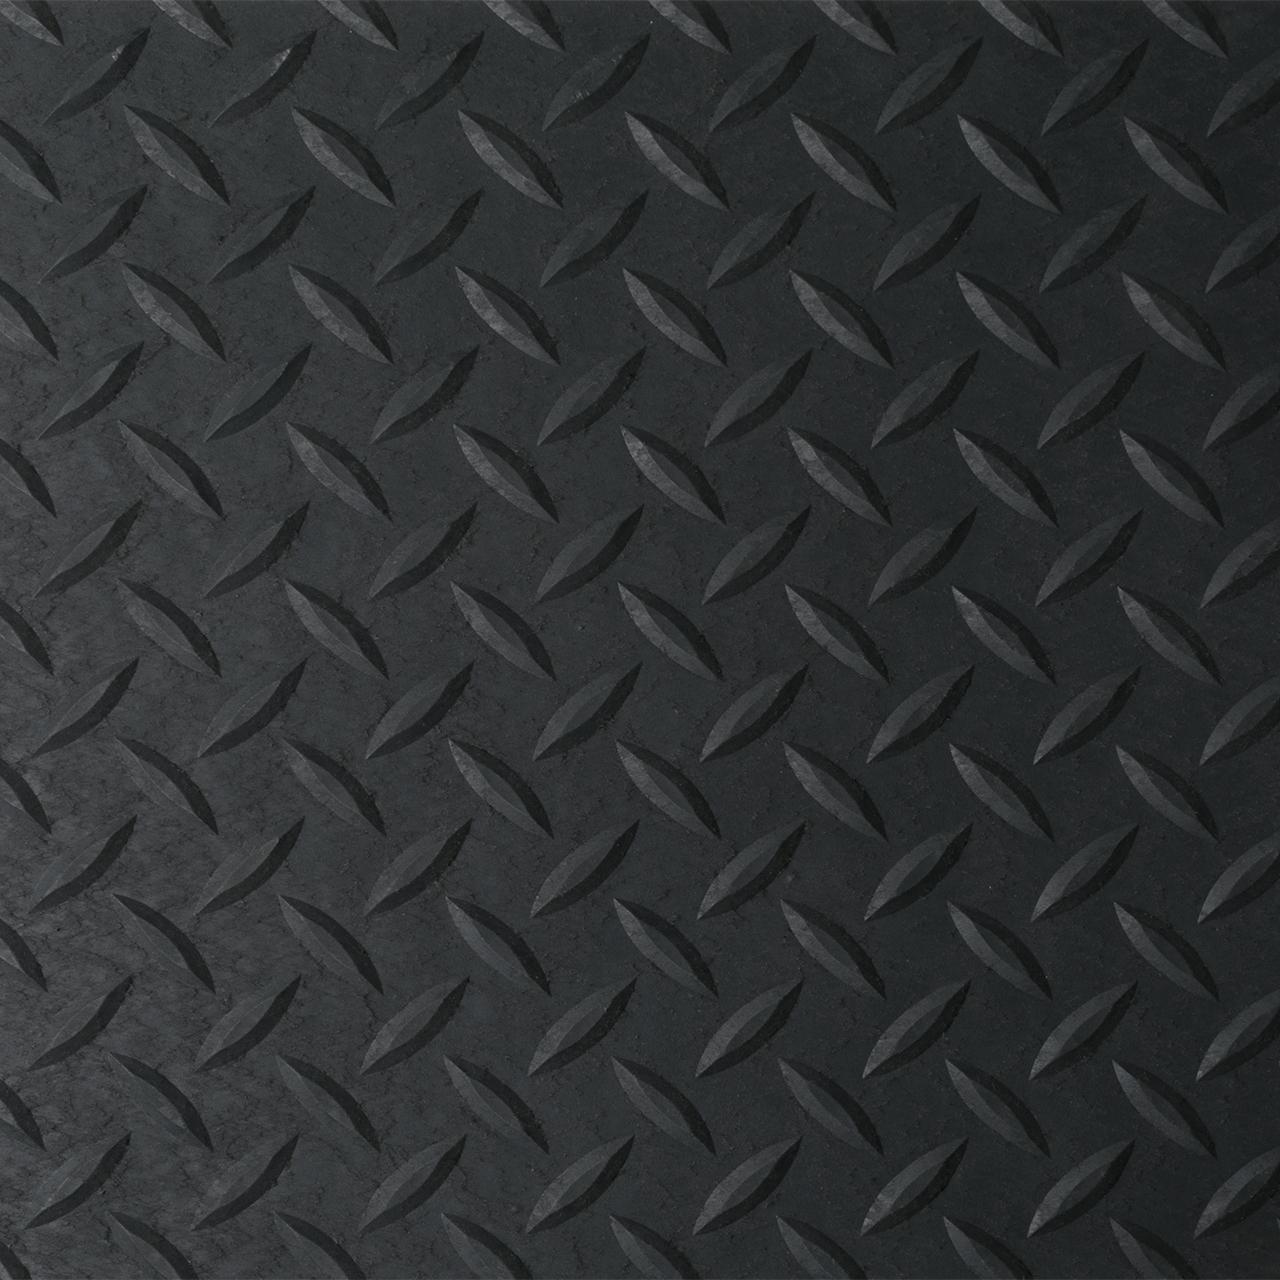 Ground Protection Matting | Koro-Shield